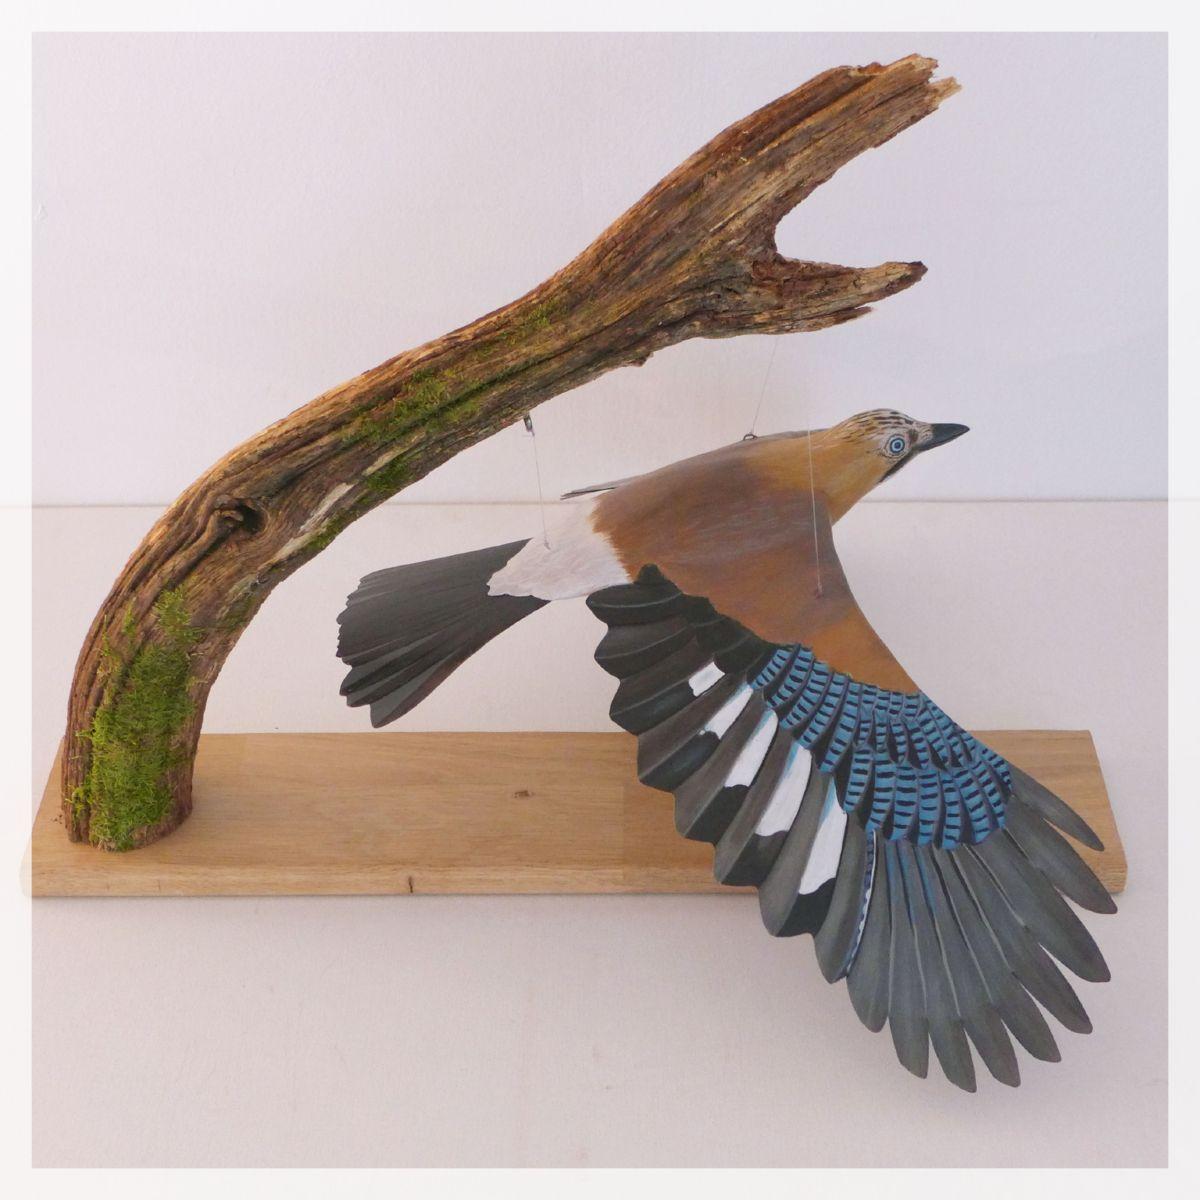 sculpture geai des chêne eurasian jay